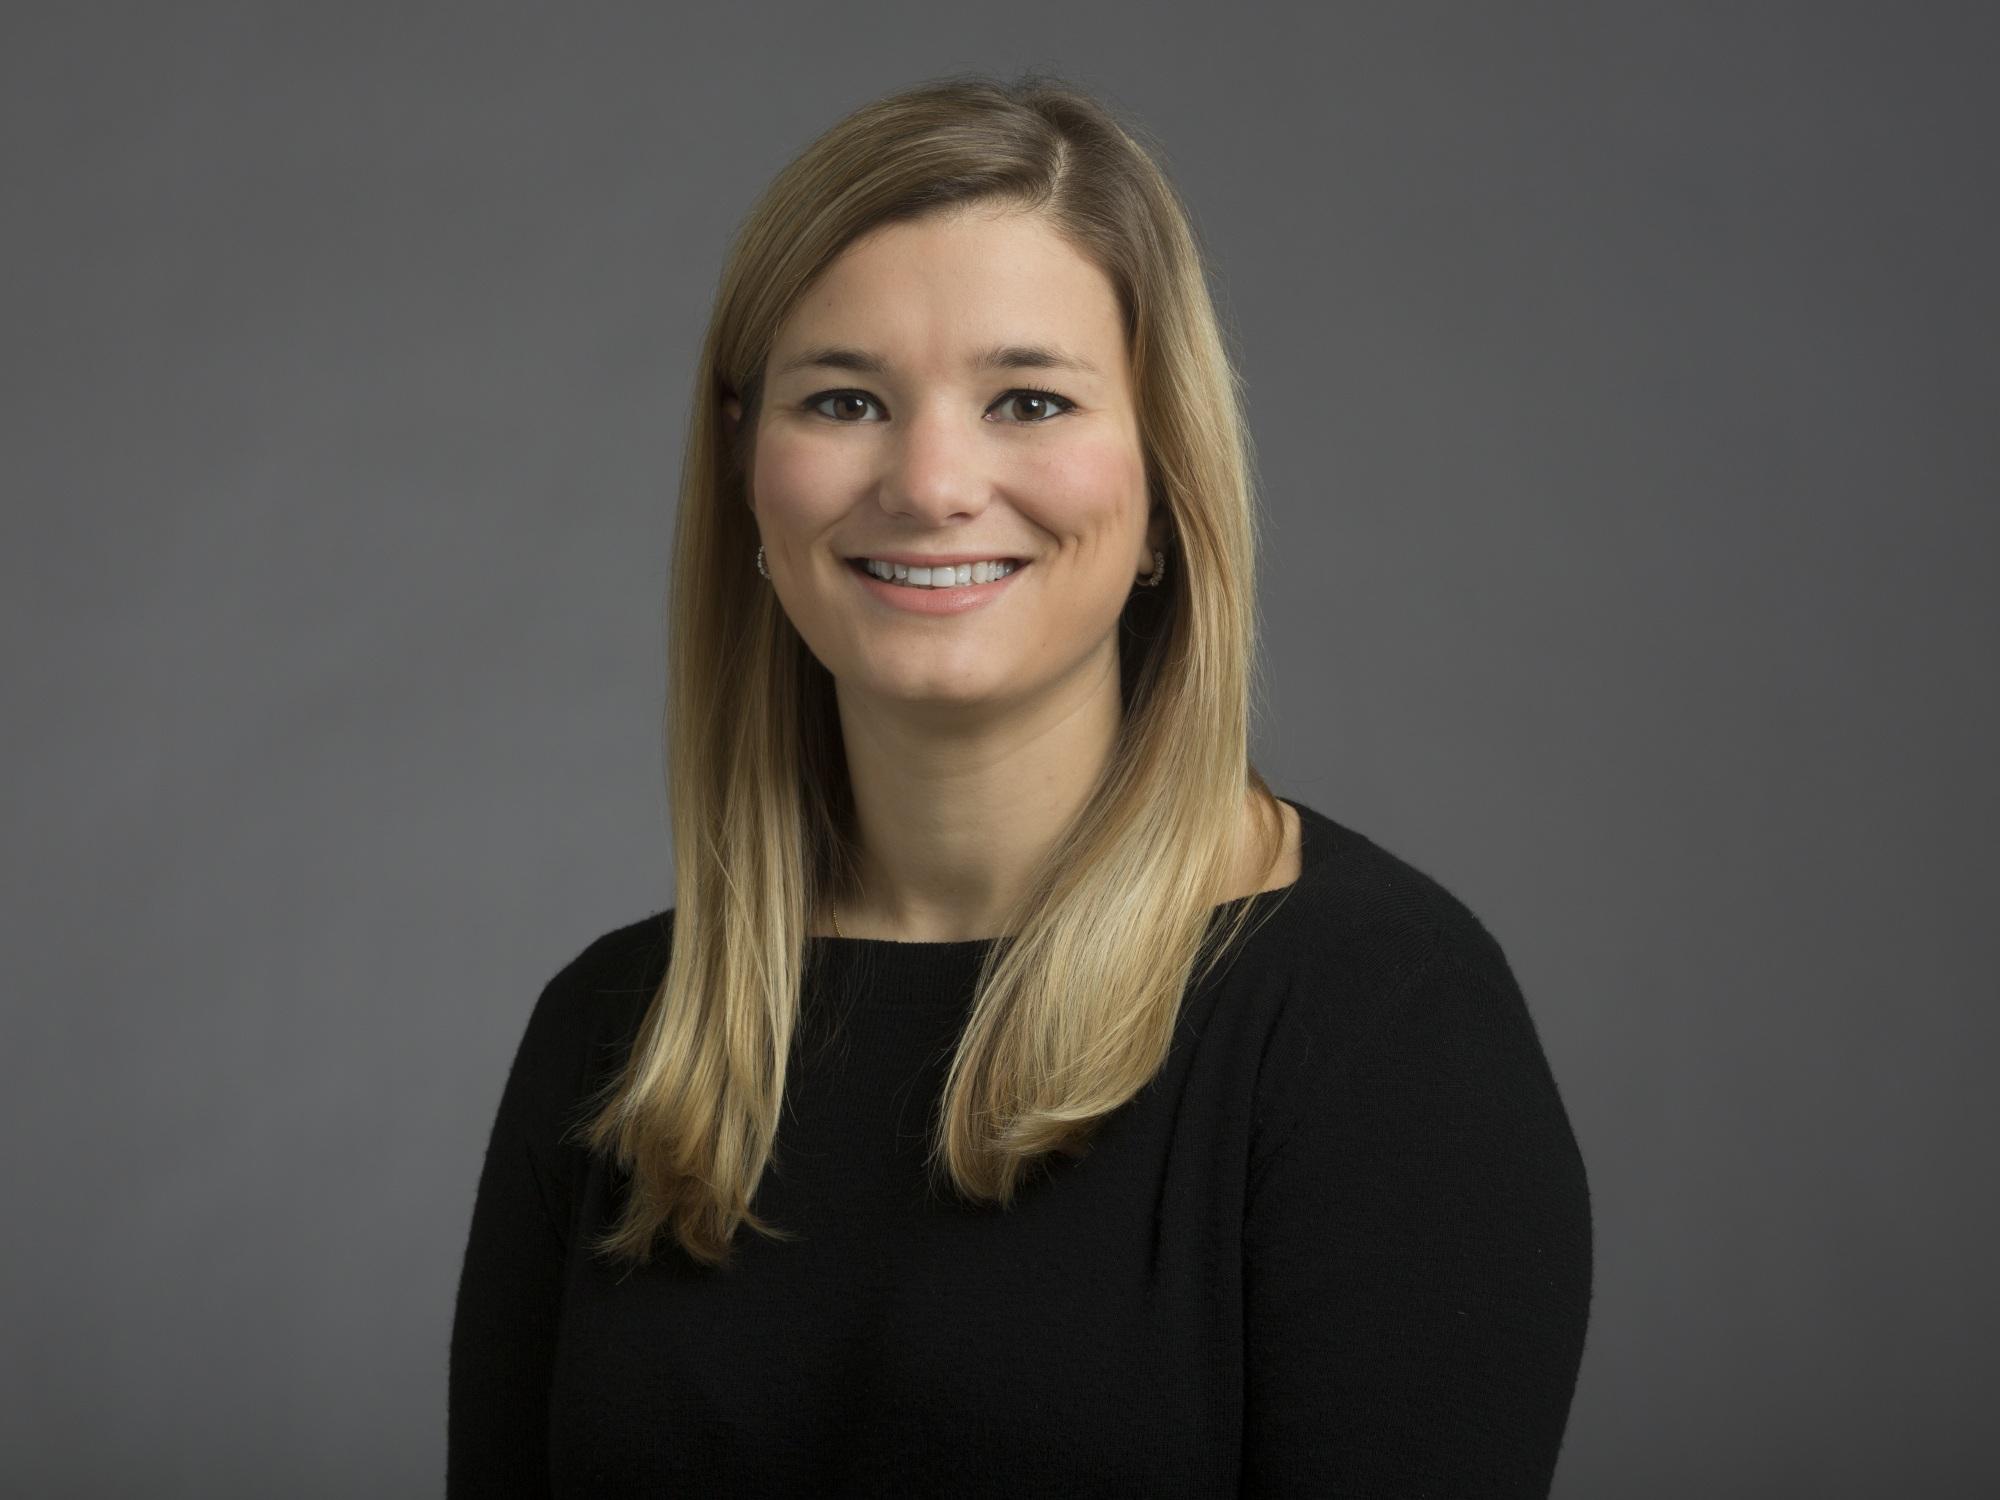 Allie Wainer, PhD